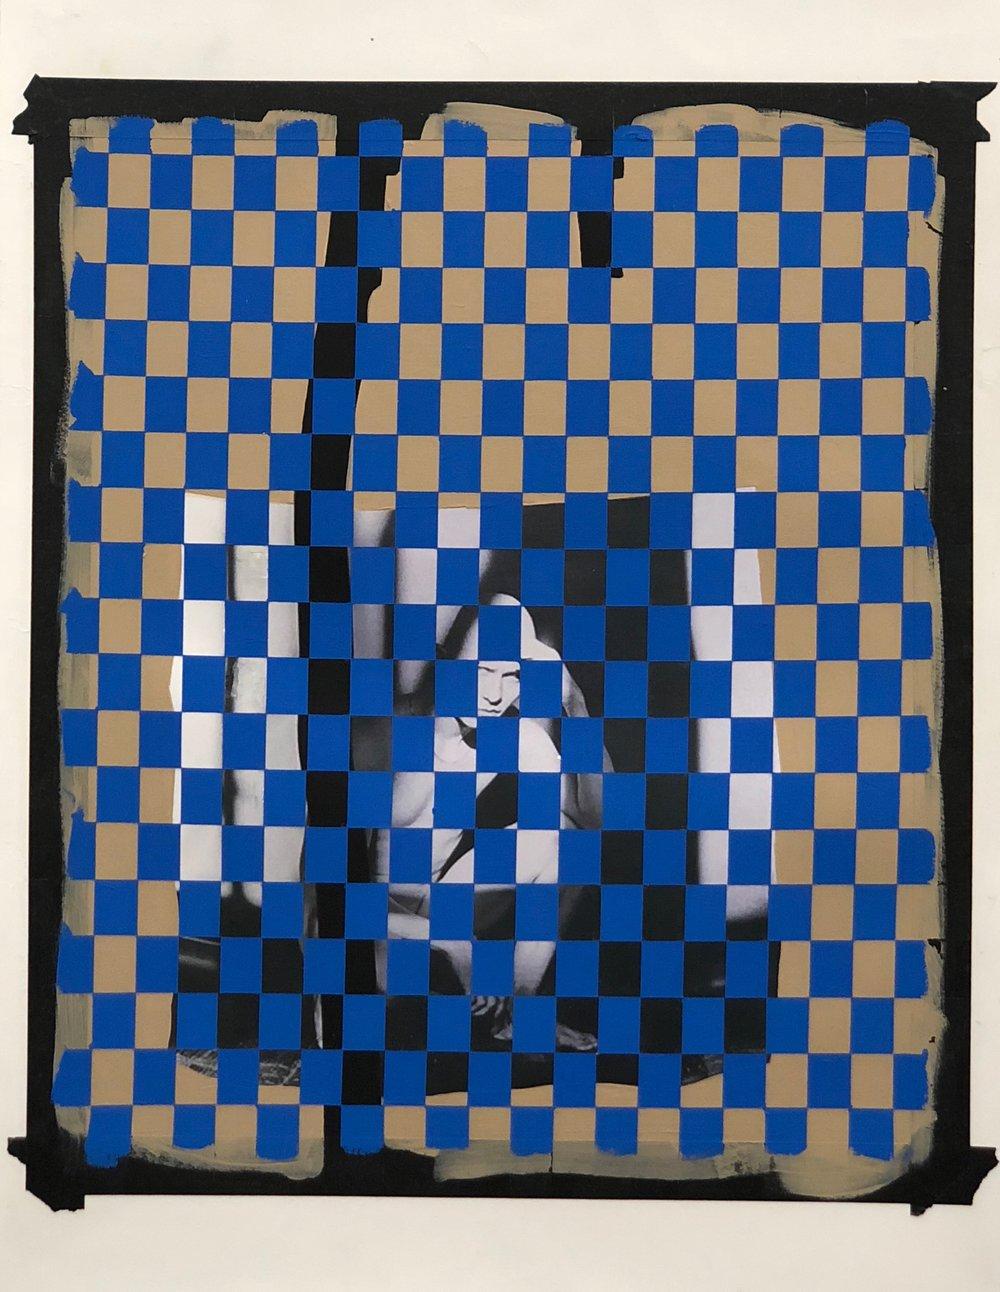 Tim Doud,  RSRMP (Cobalt),  2018, Digital Photo, Acrylic paint and Flashe paint on paper, 46 x 54 cm